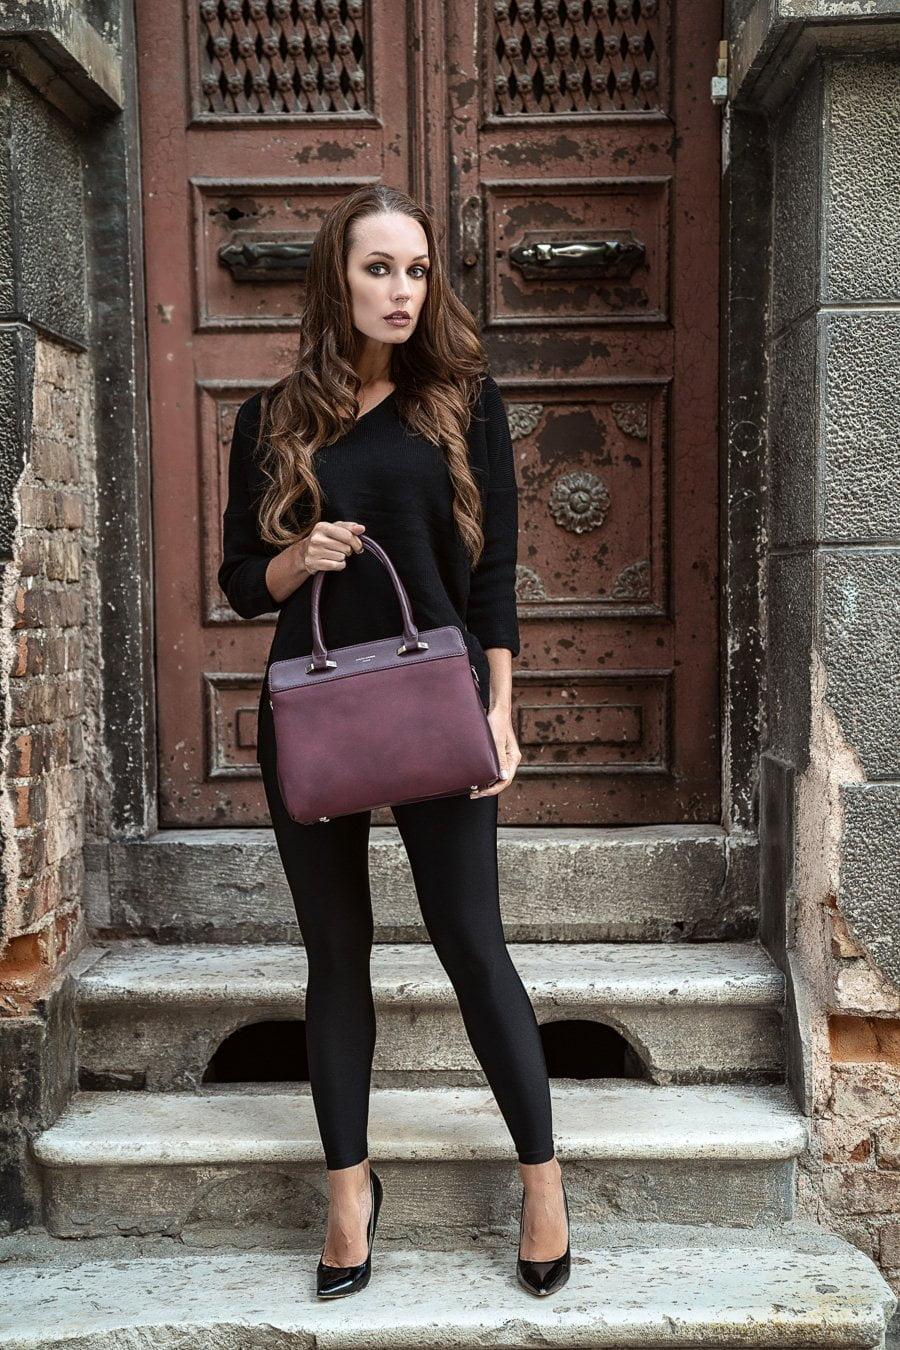 Moda Çekimi - Editorial - Beauty moda tekstil burakbulutfotografatolyesi 28